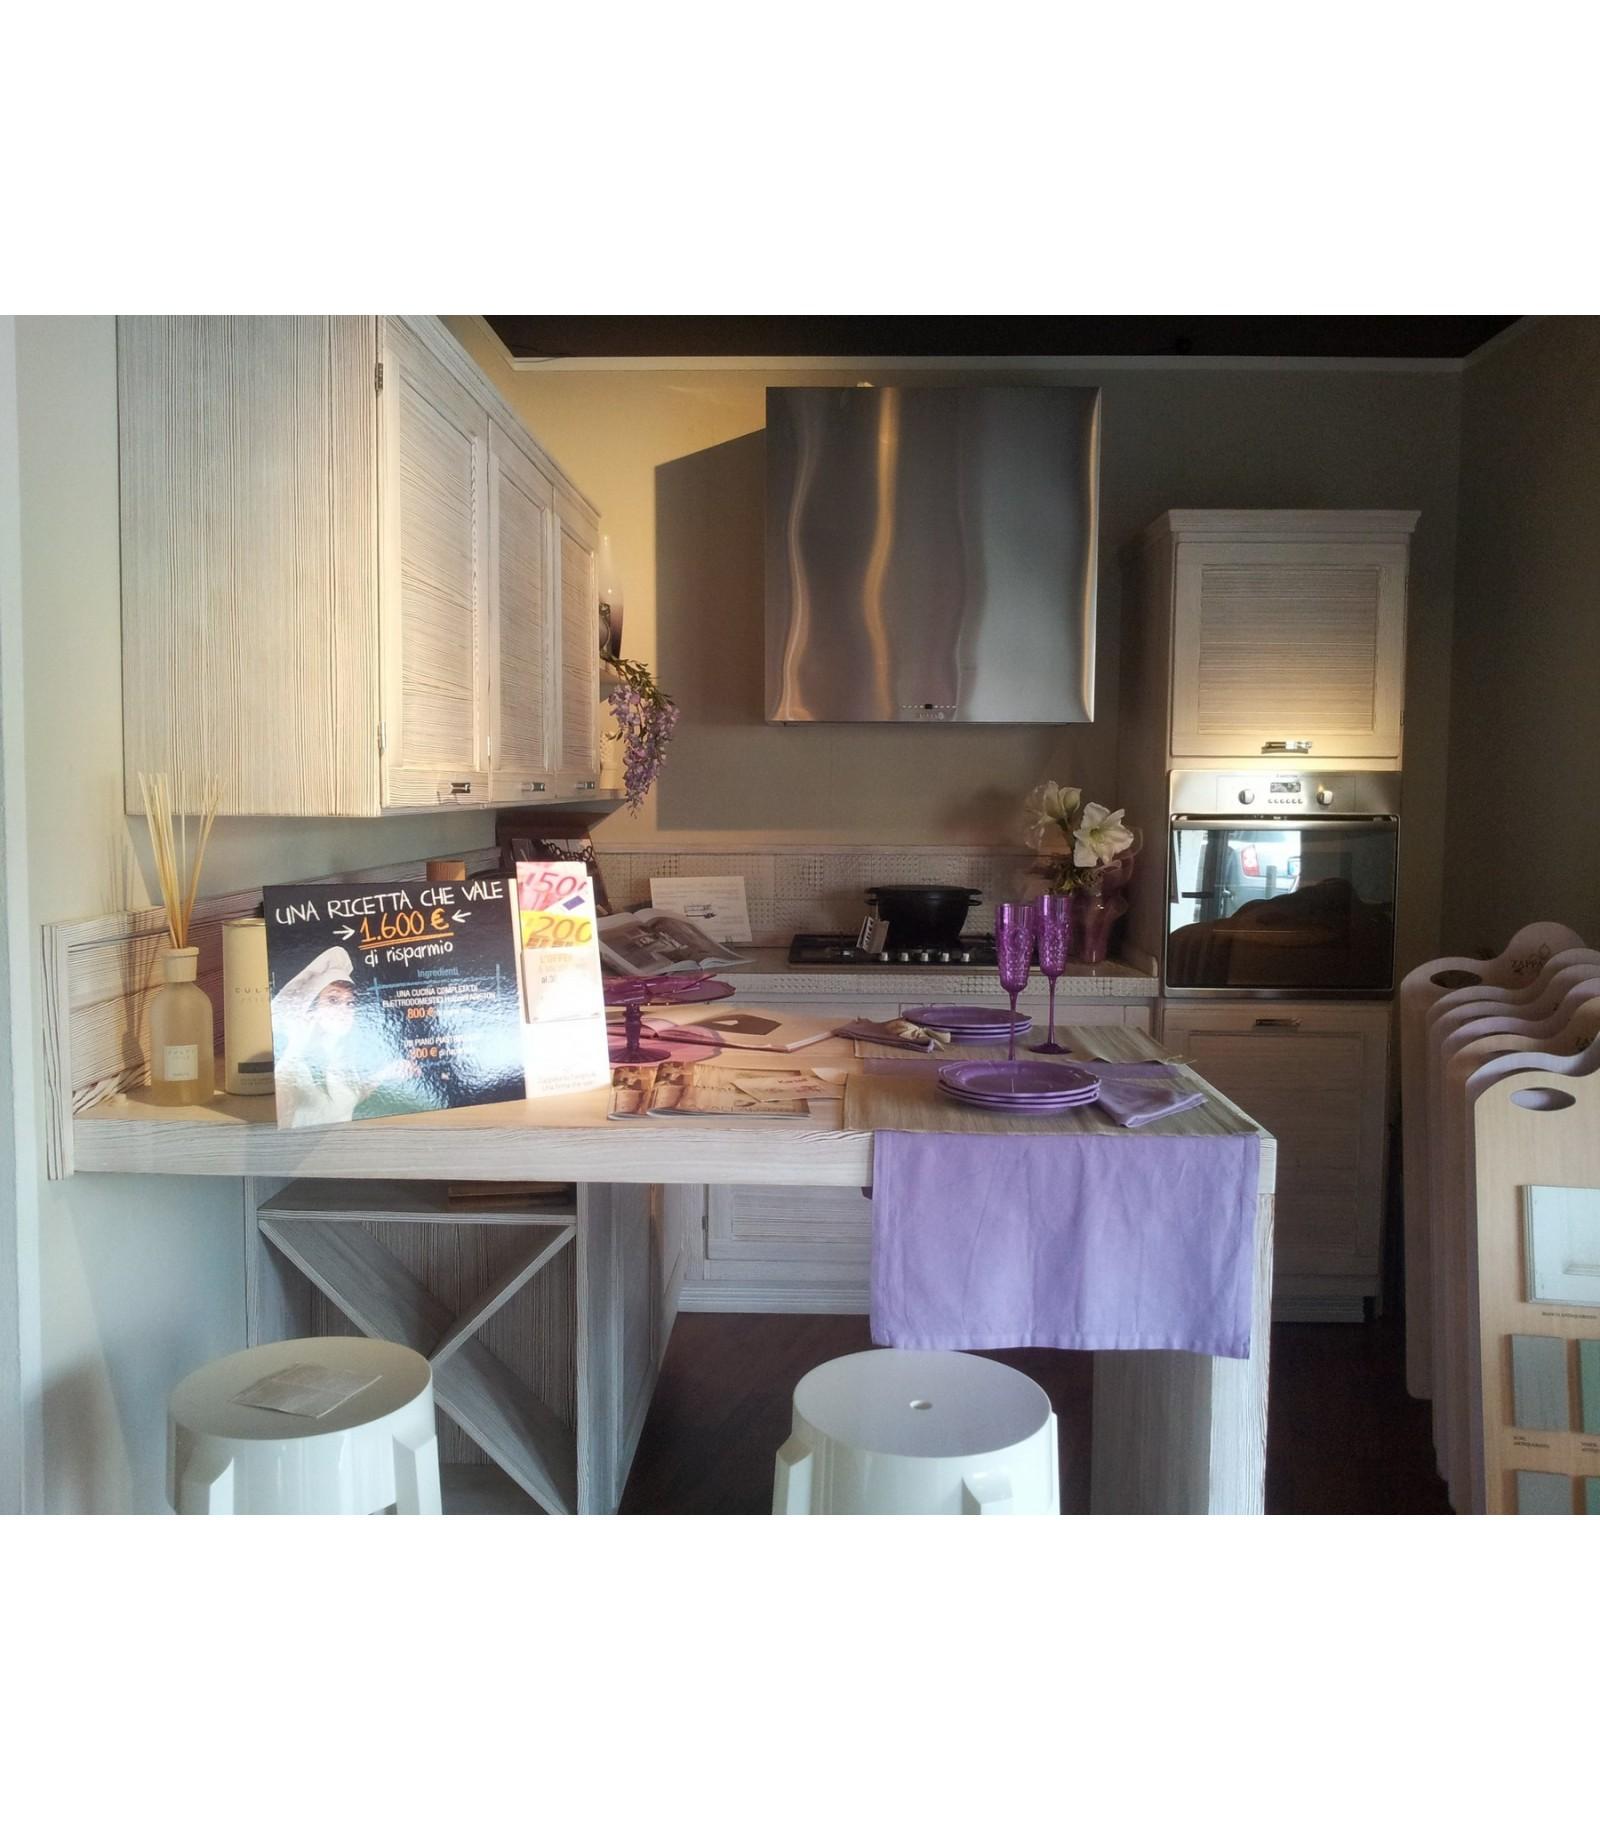 Cucina Terre di Toscana di Zappalorto